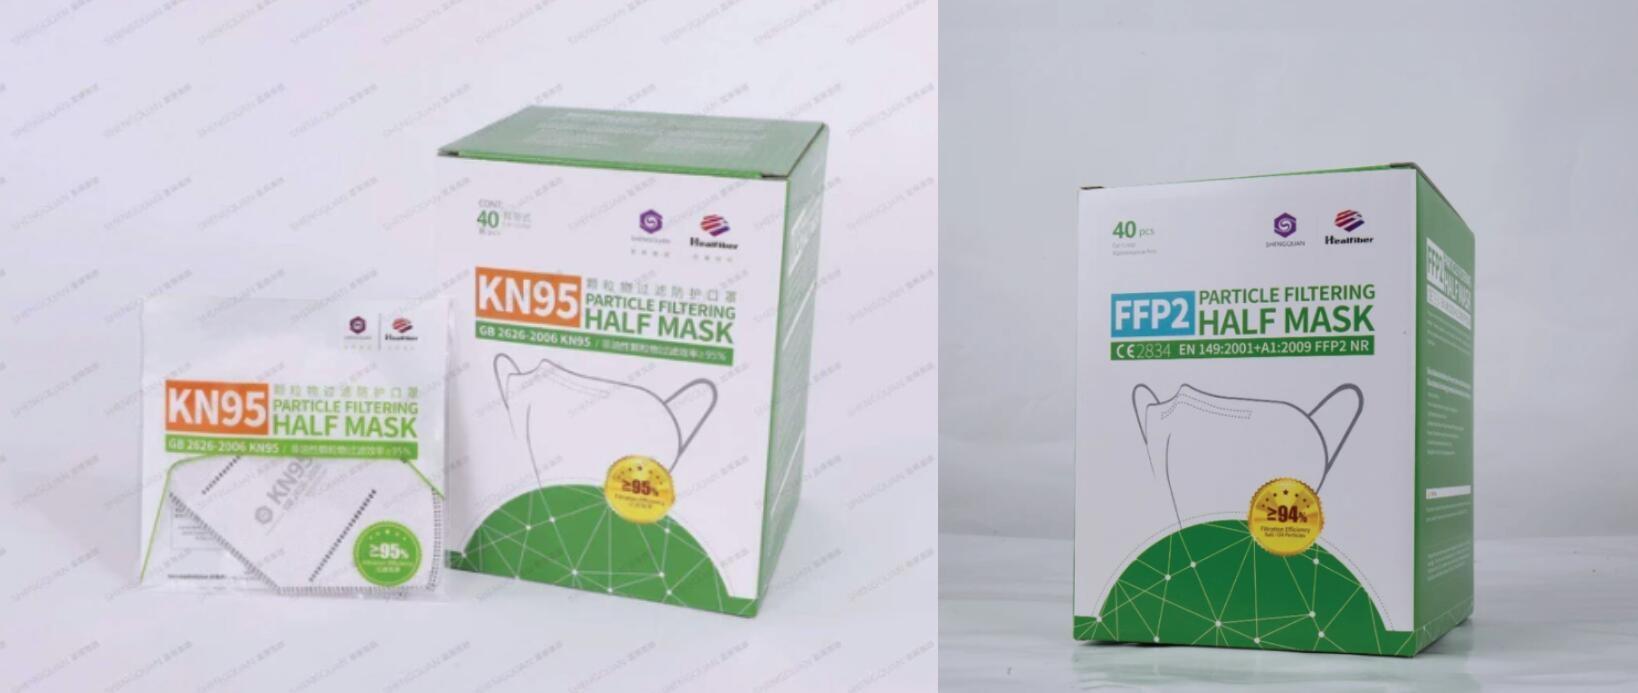 KN95 FFP2 P2 FACE MASK